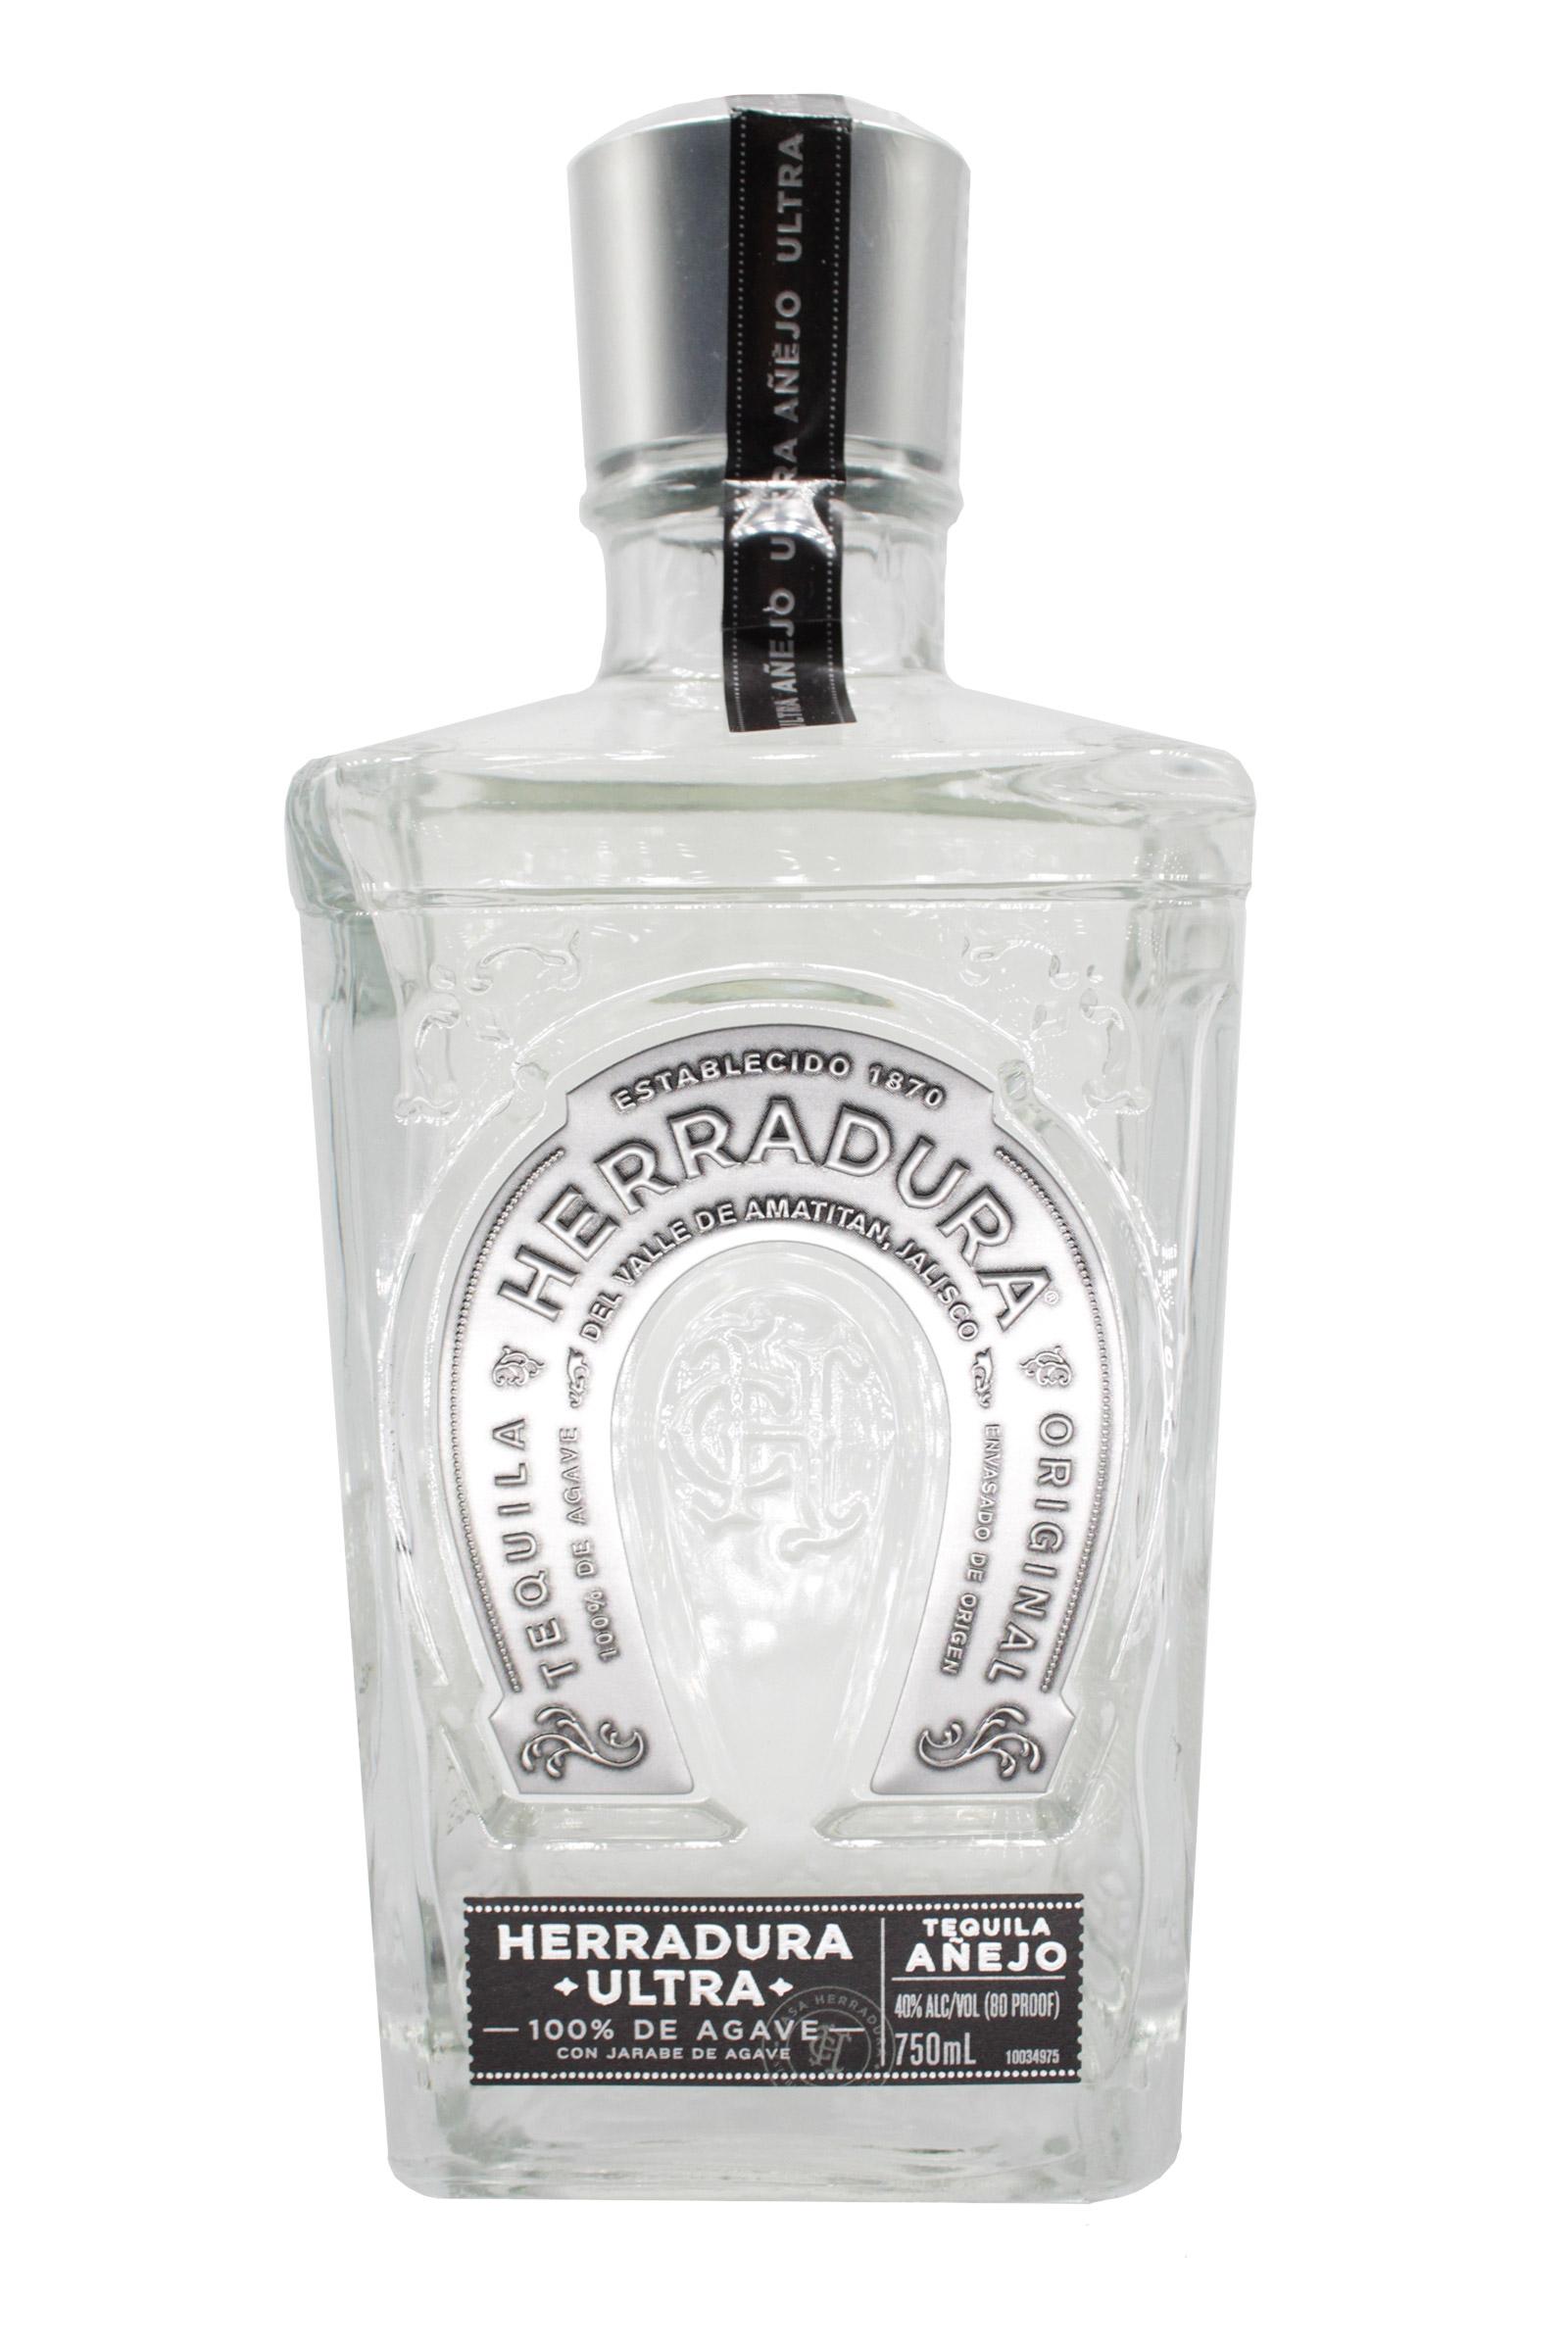 Tequila Herradura Ultra Añejo 100% Agave 750ml